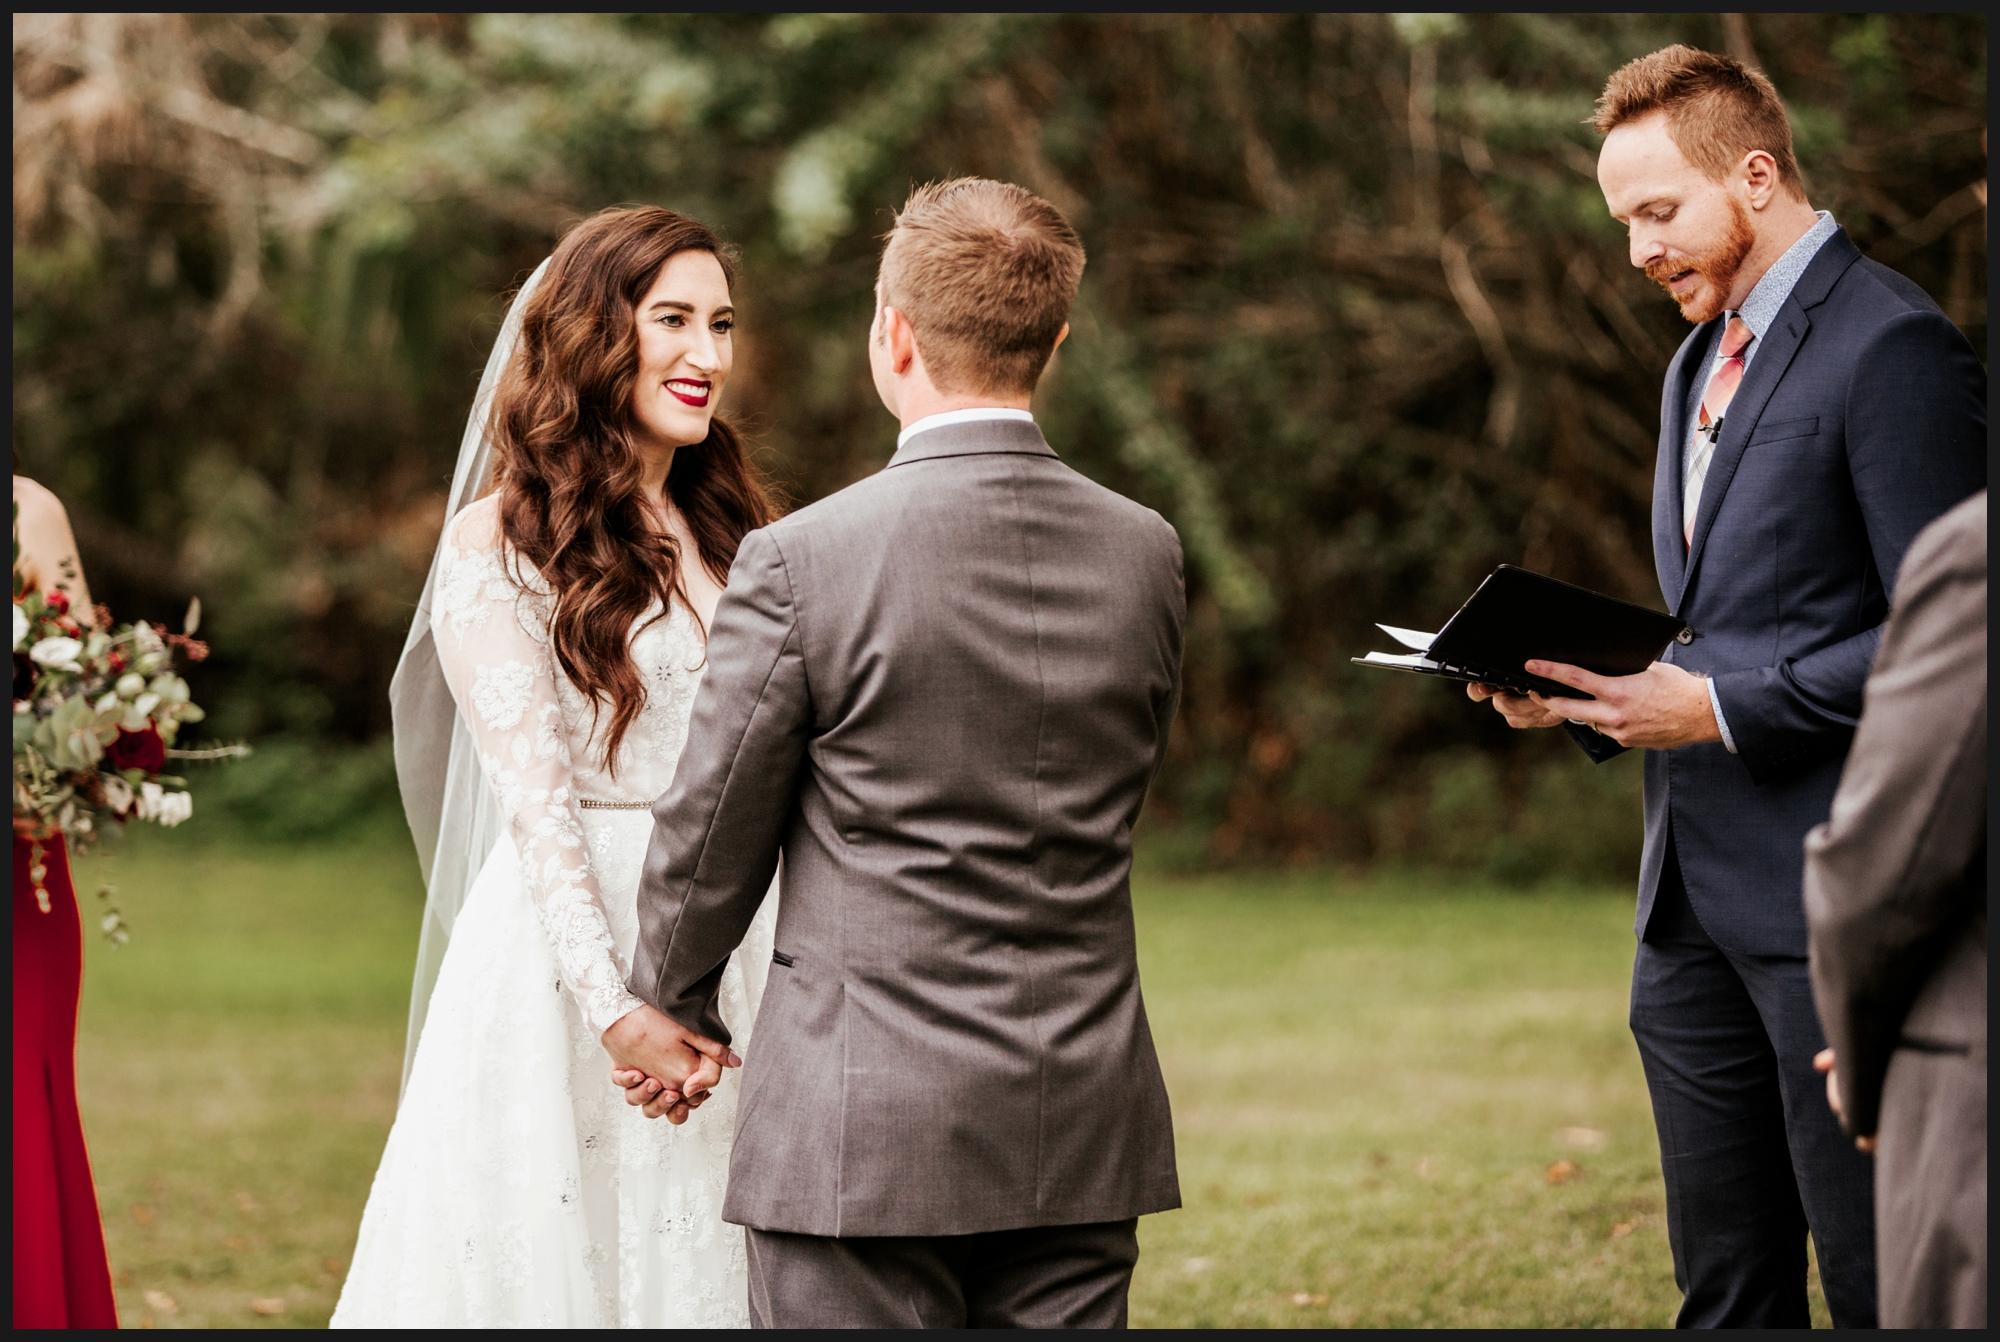 Orlando-Wedding-Photographer-destination-wedding-photographer-florida-wedding-photographer-hawaii-wedding-photographer_0524.jpg